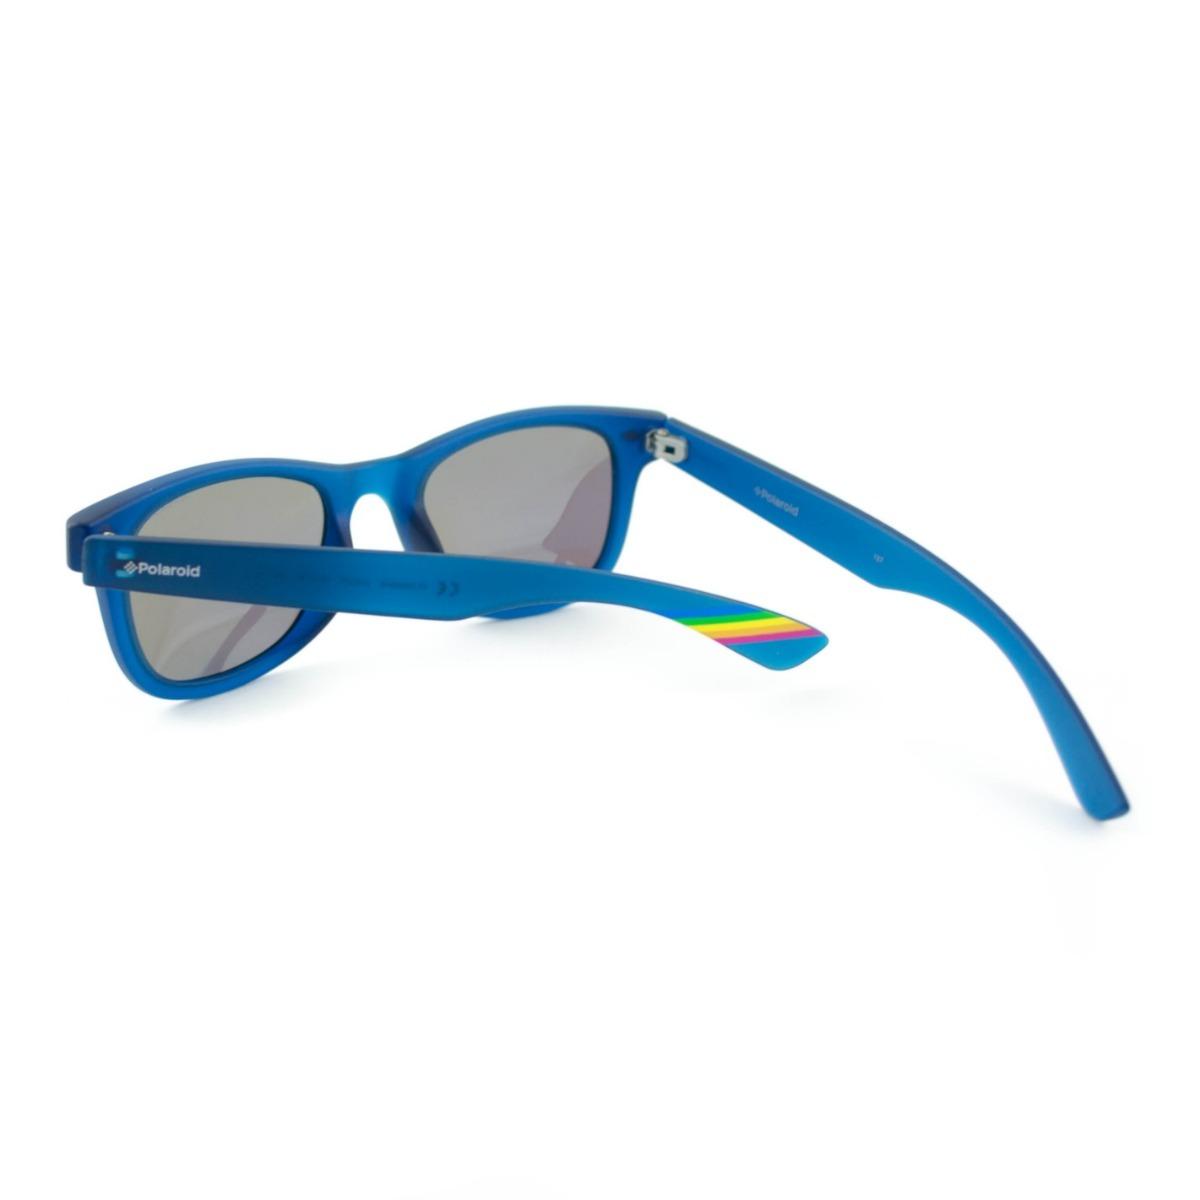 óculos de sol infantil polaroid kids - pld8009 n ujojy azul. Carregando  zoom. 299b2a6621